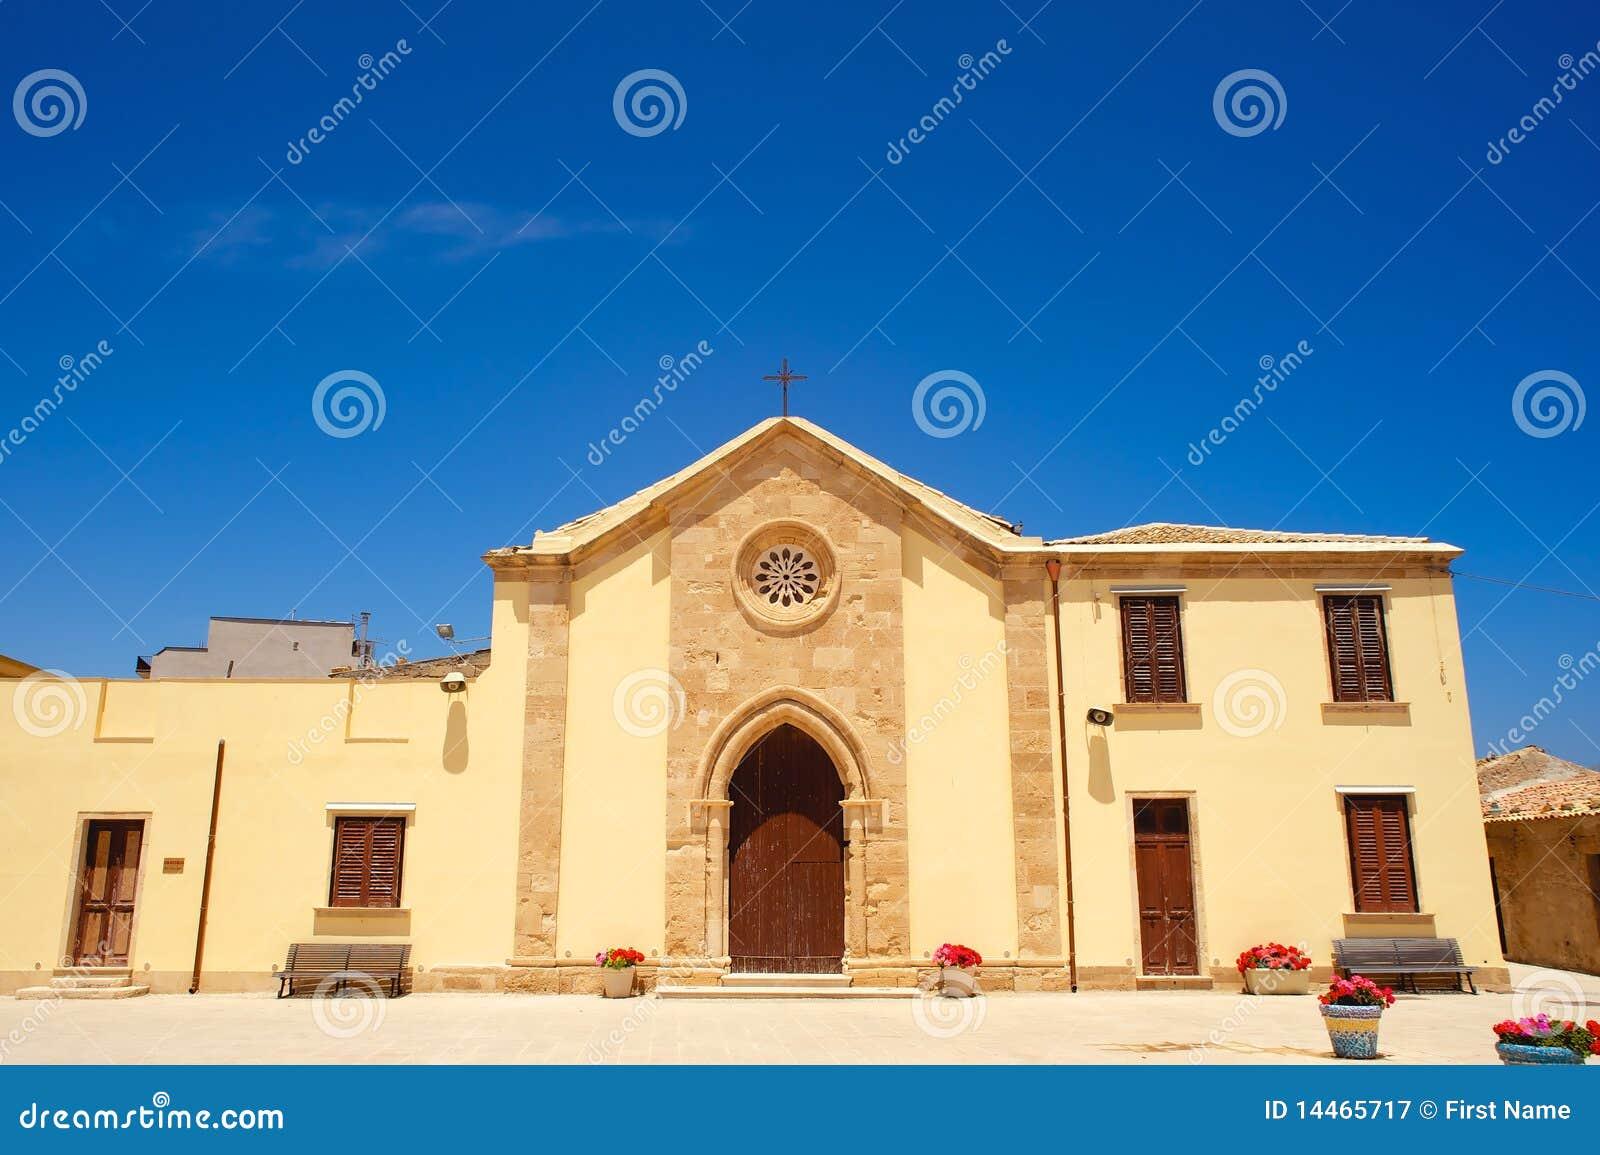 Oude herstelde kapel in Marzamemi, Sicilië (Italië)